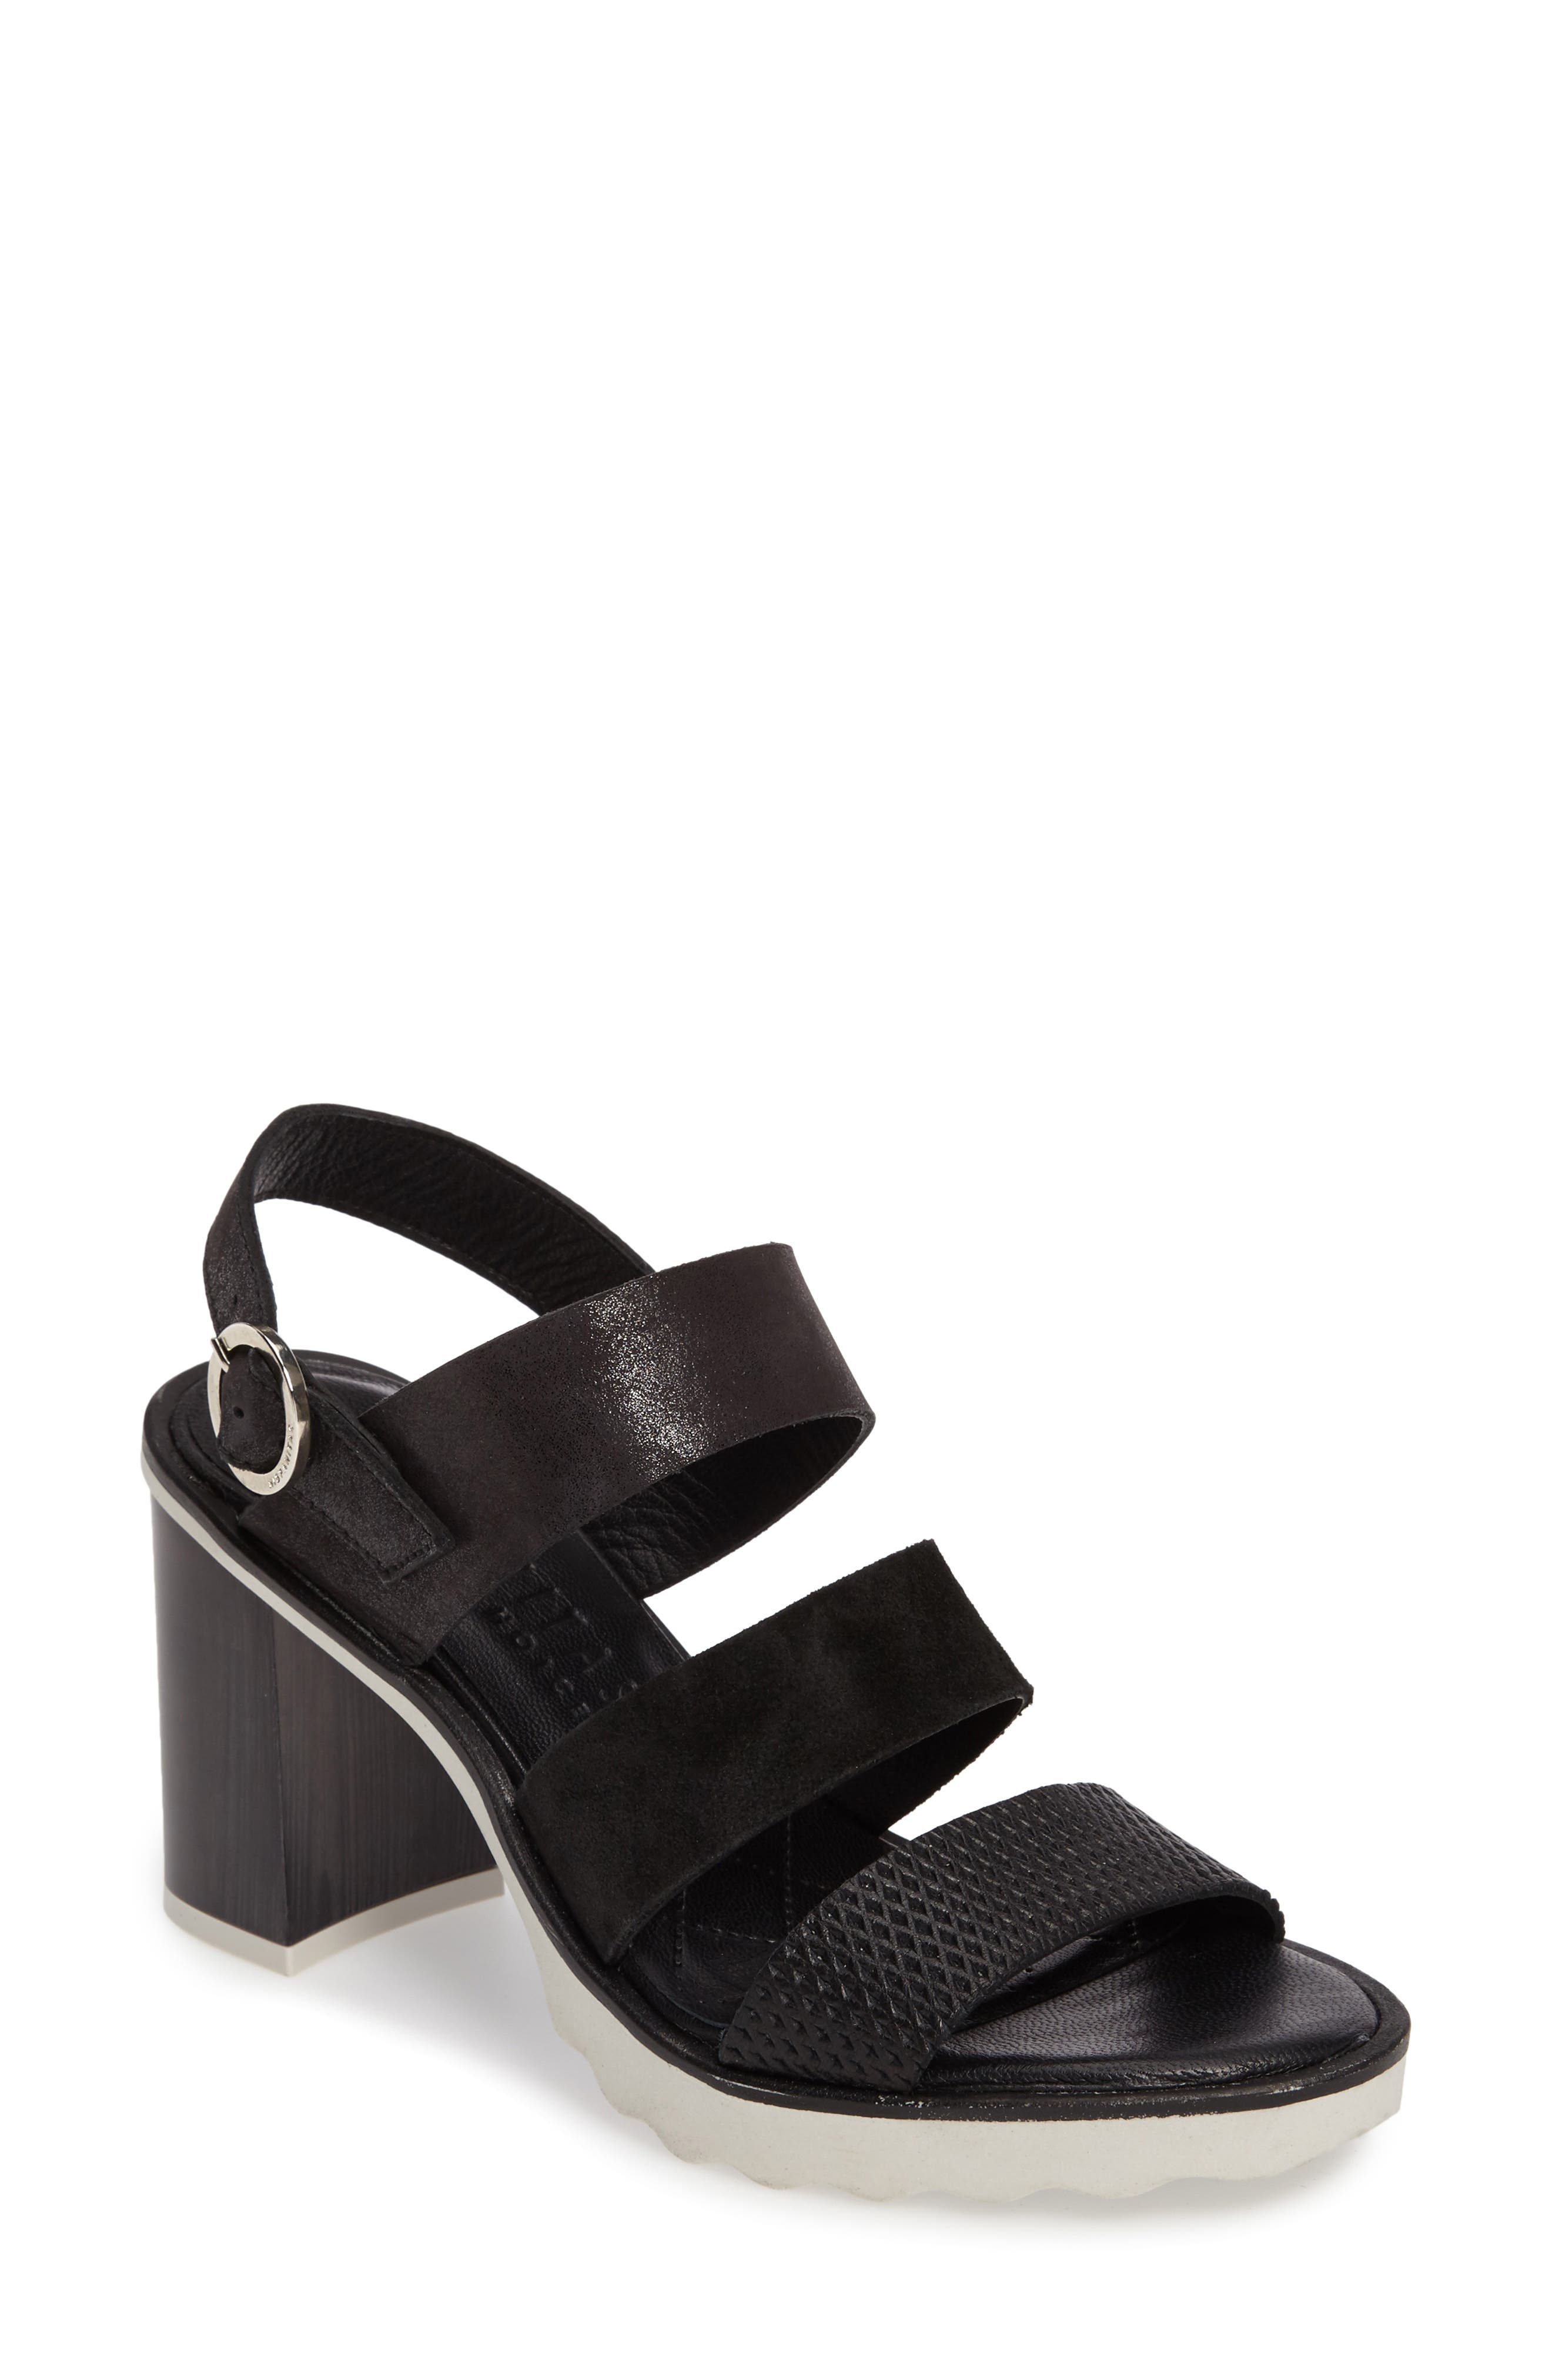 Greer Strappy Slingback Sandal,                         Main,                         color, 001